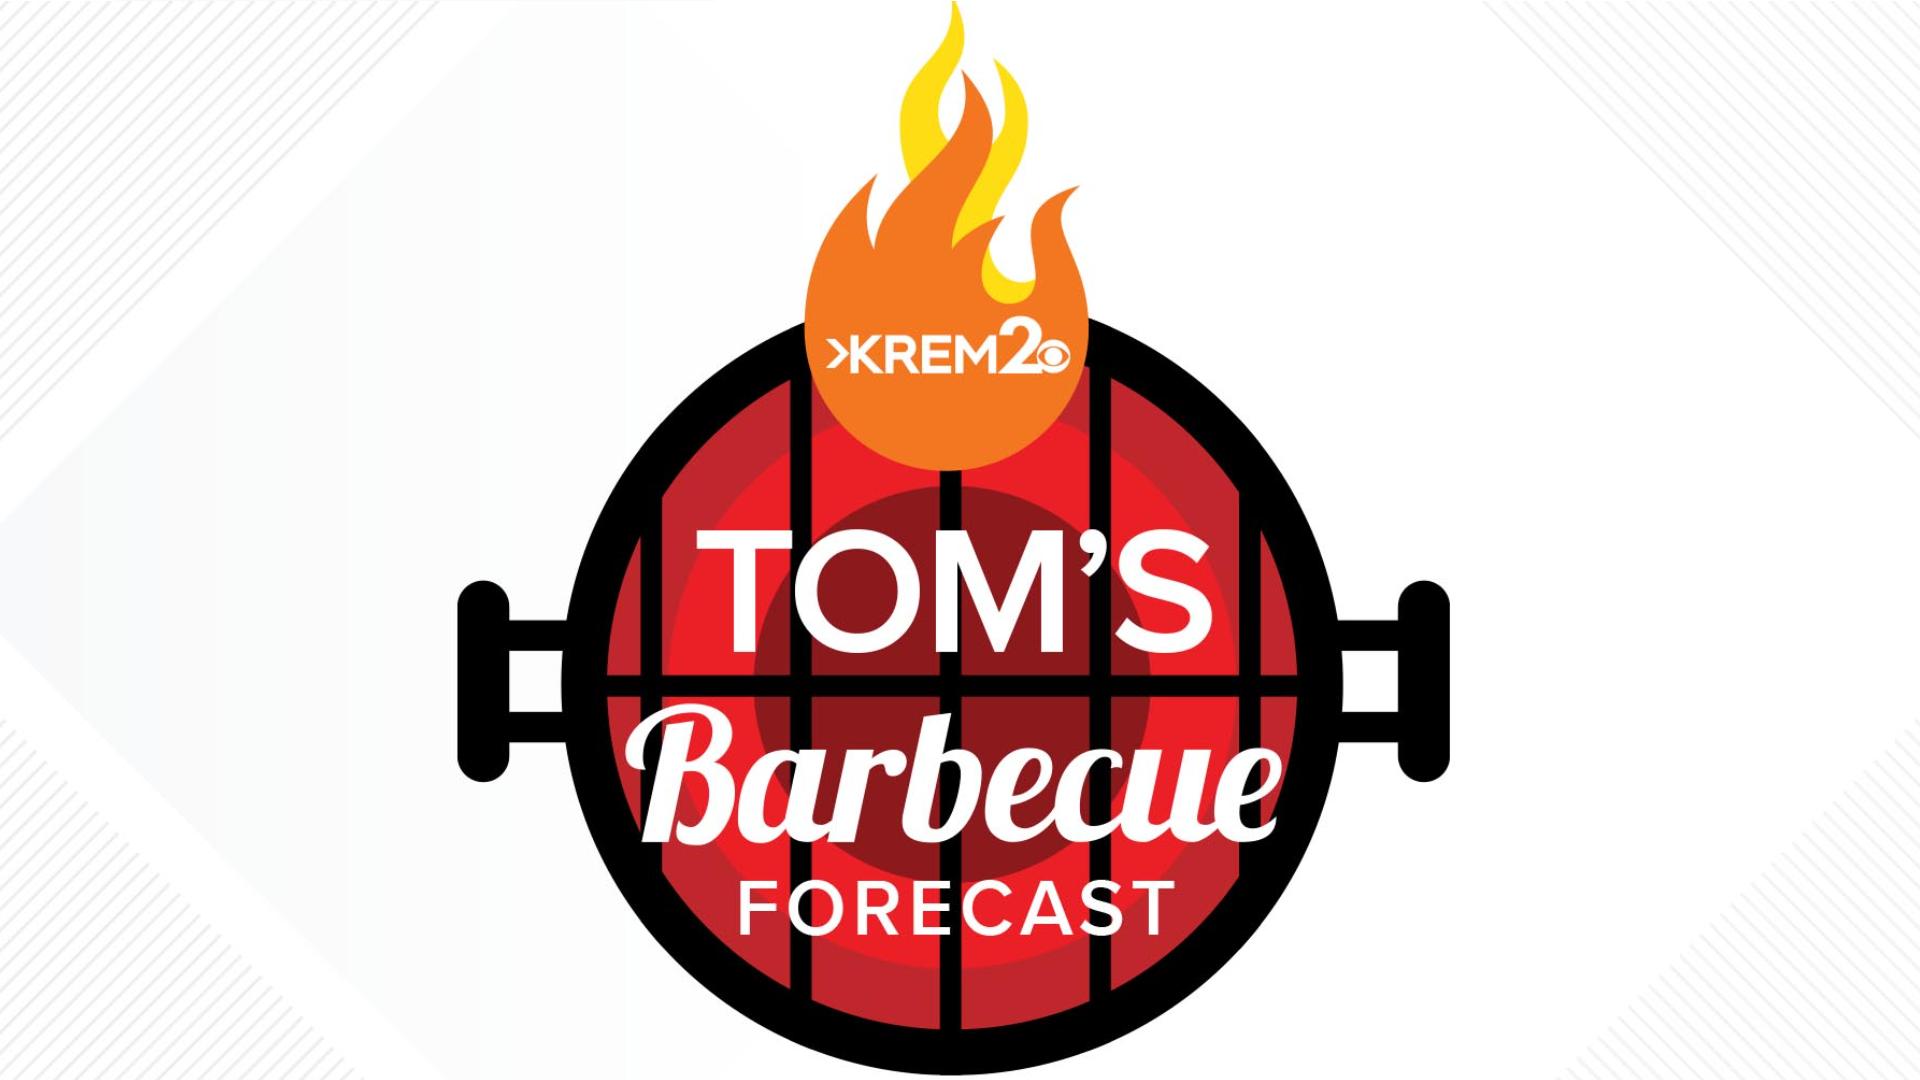 Tom's Barbecue Forecast